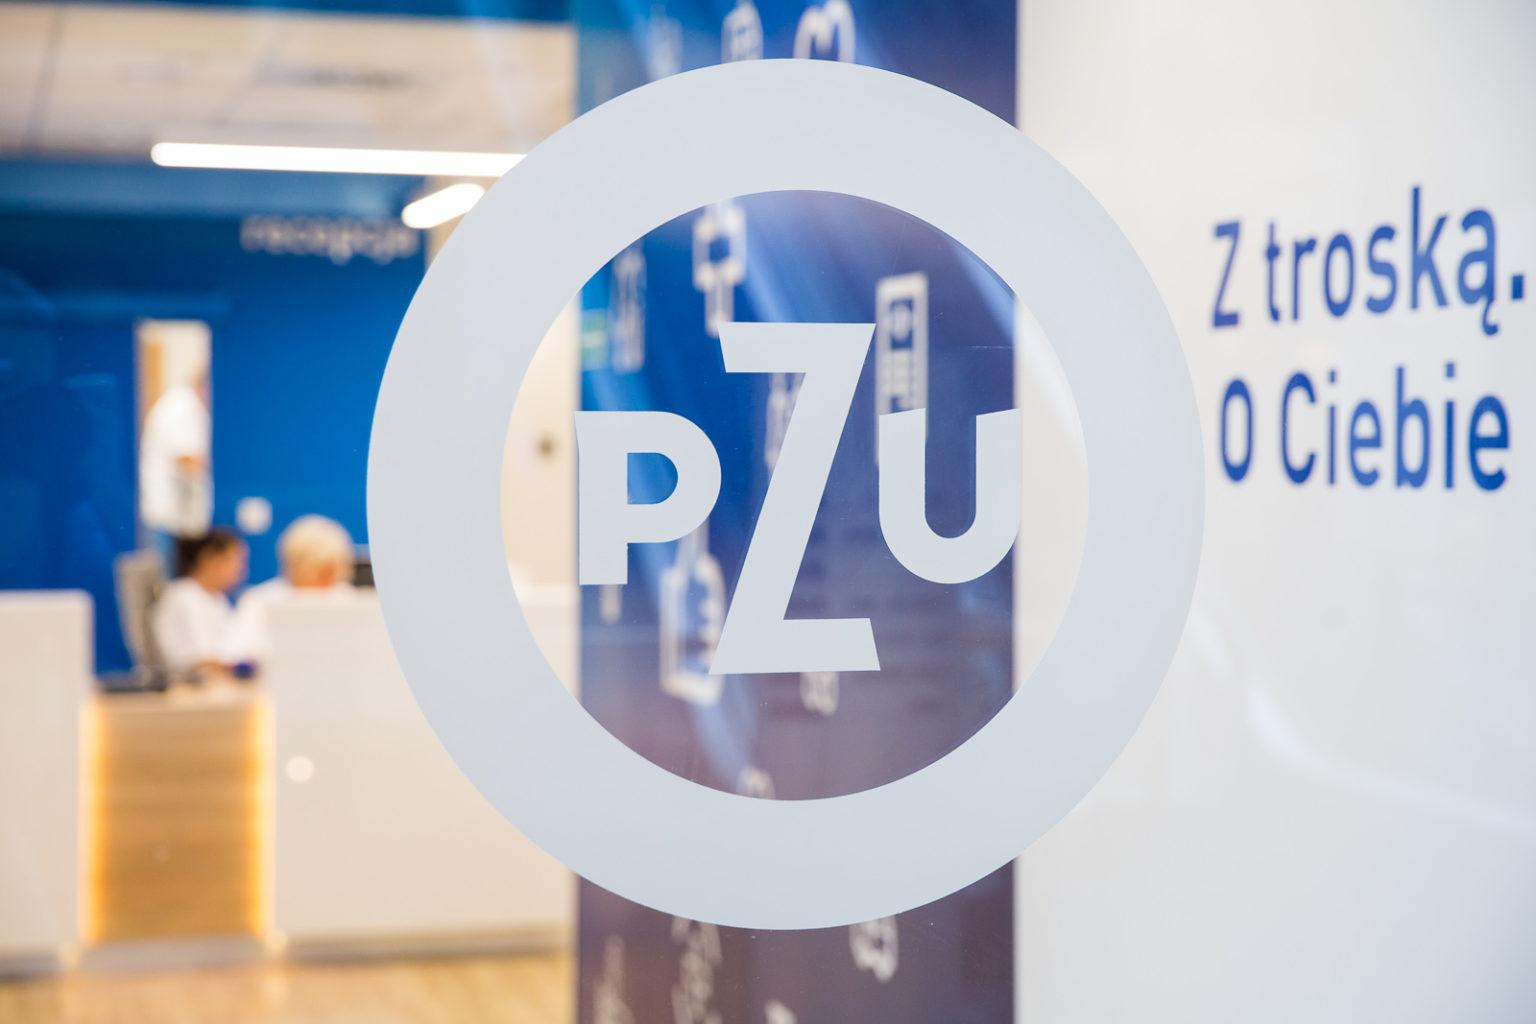 pzu_3